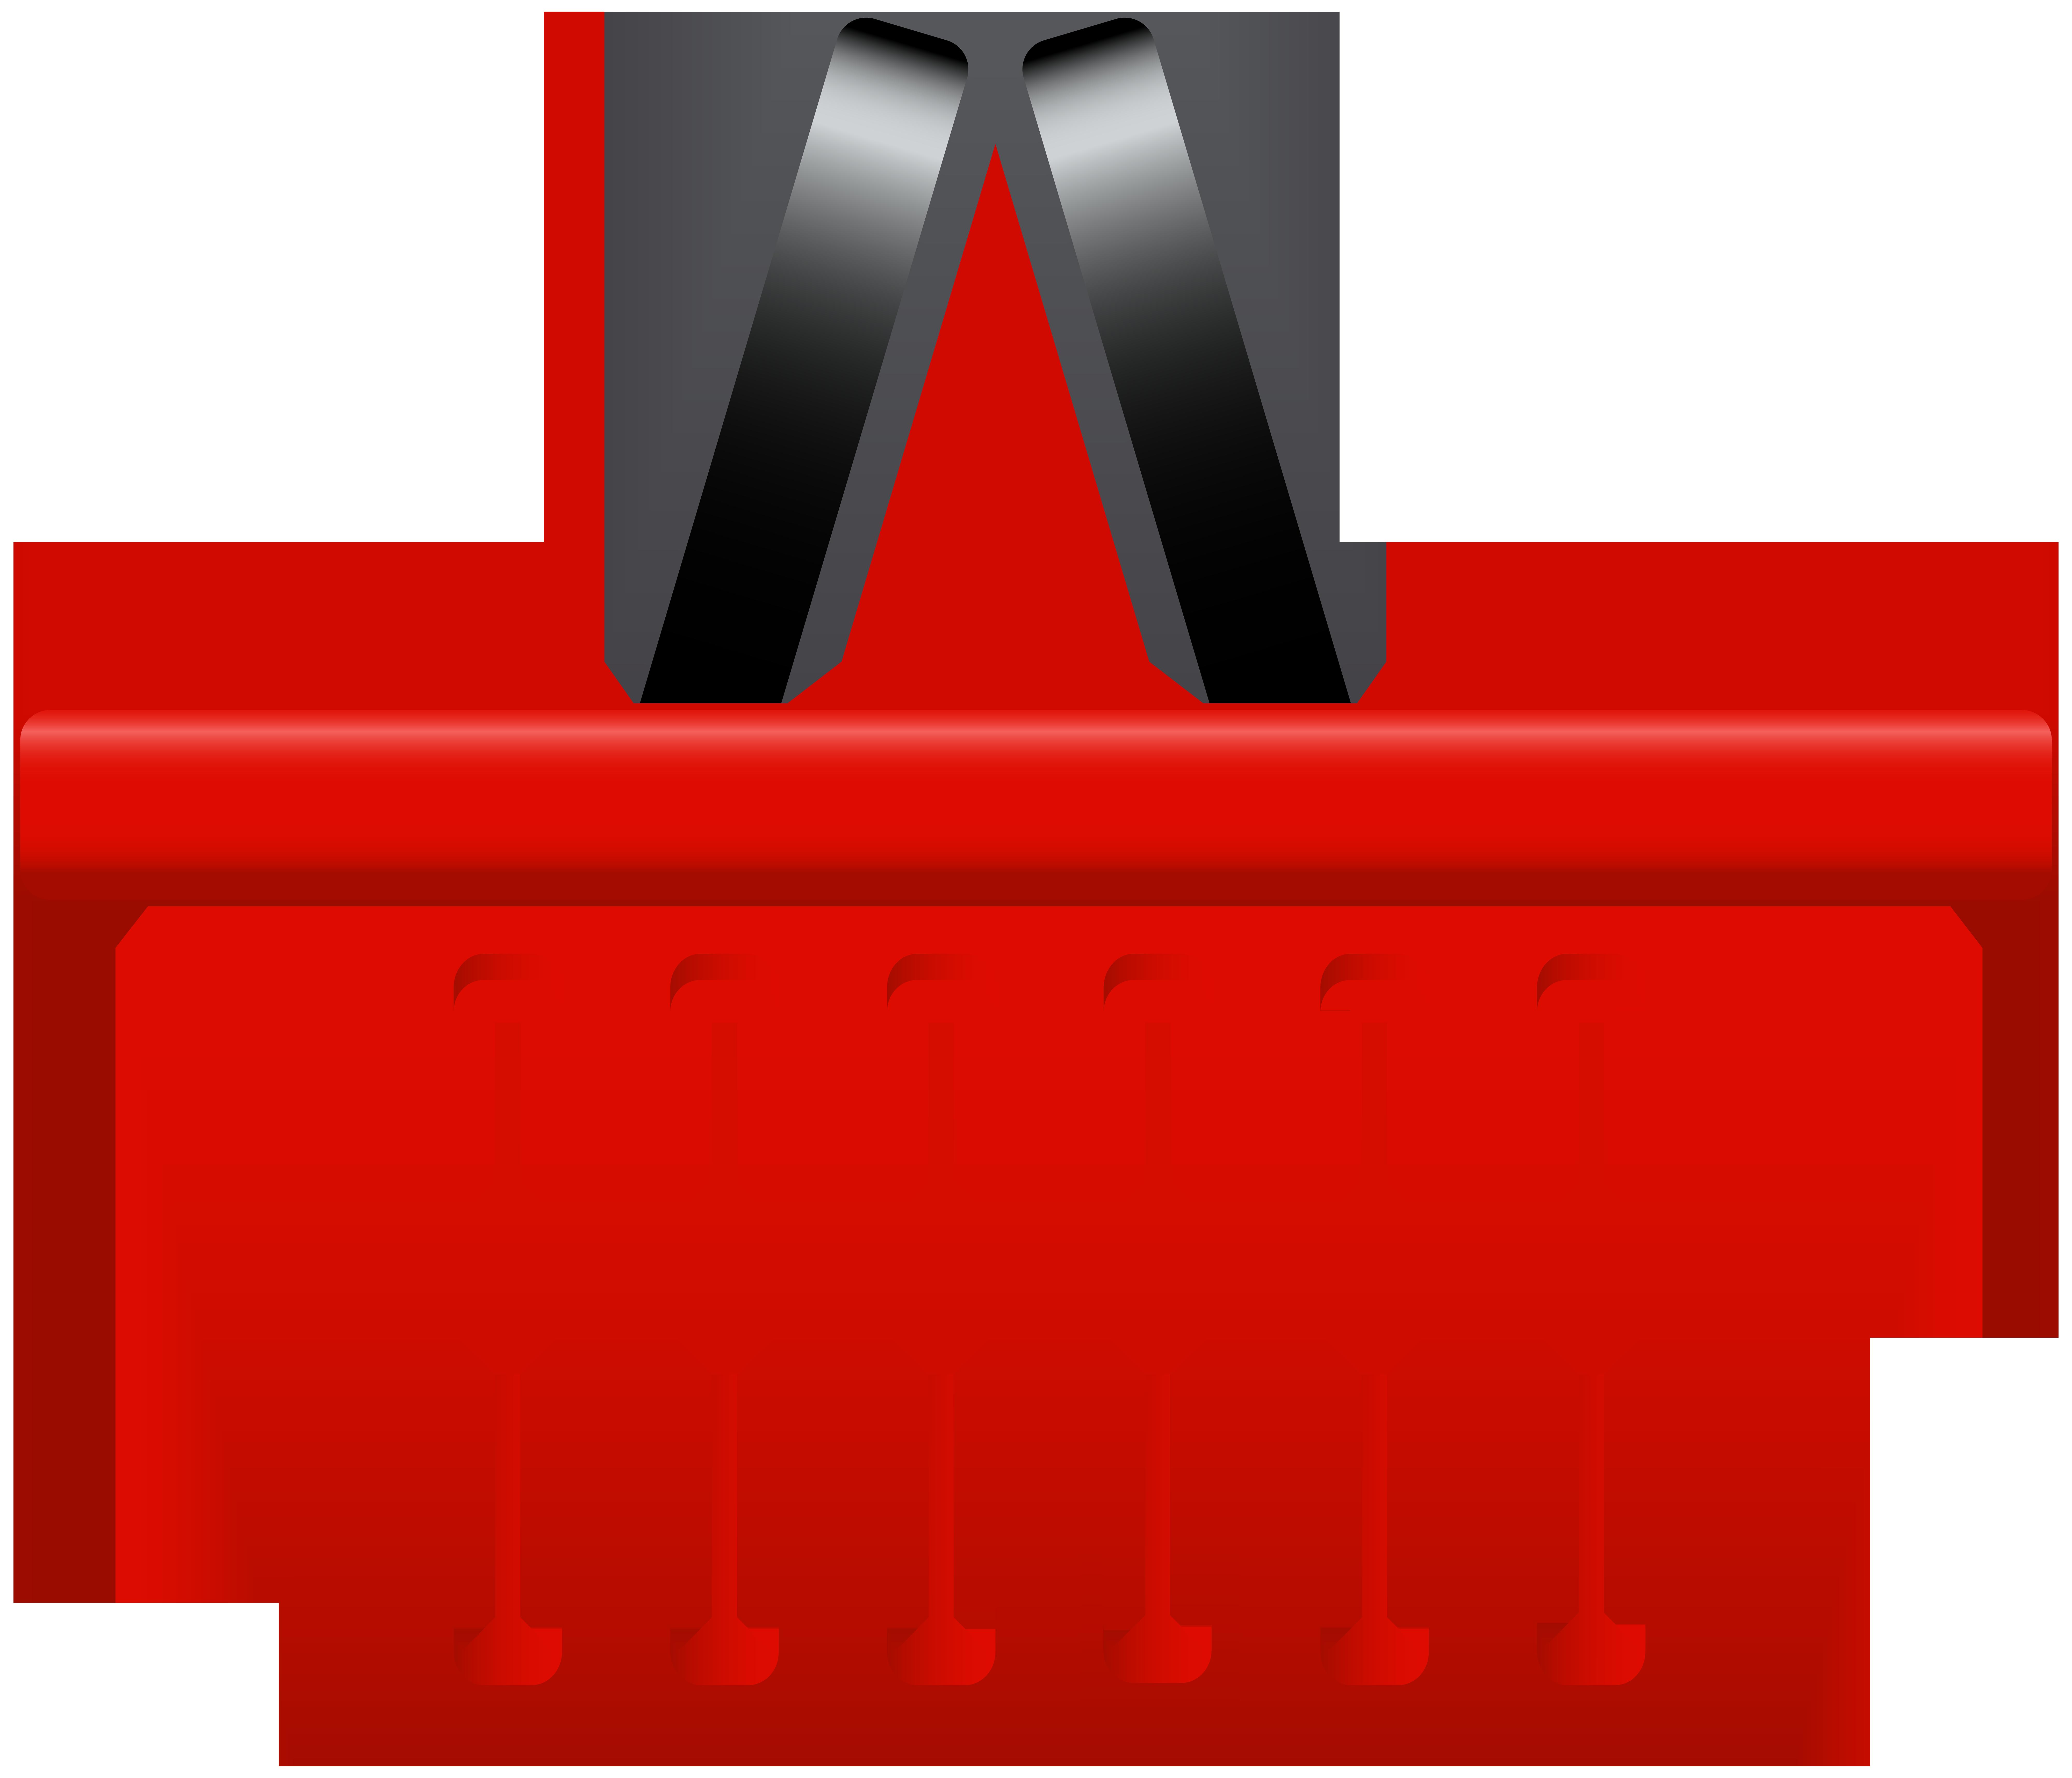 Shop clipart shop background. Red shopping basket png